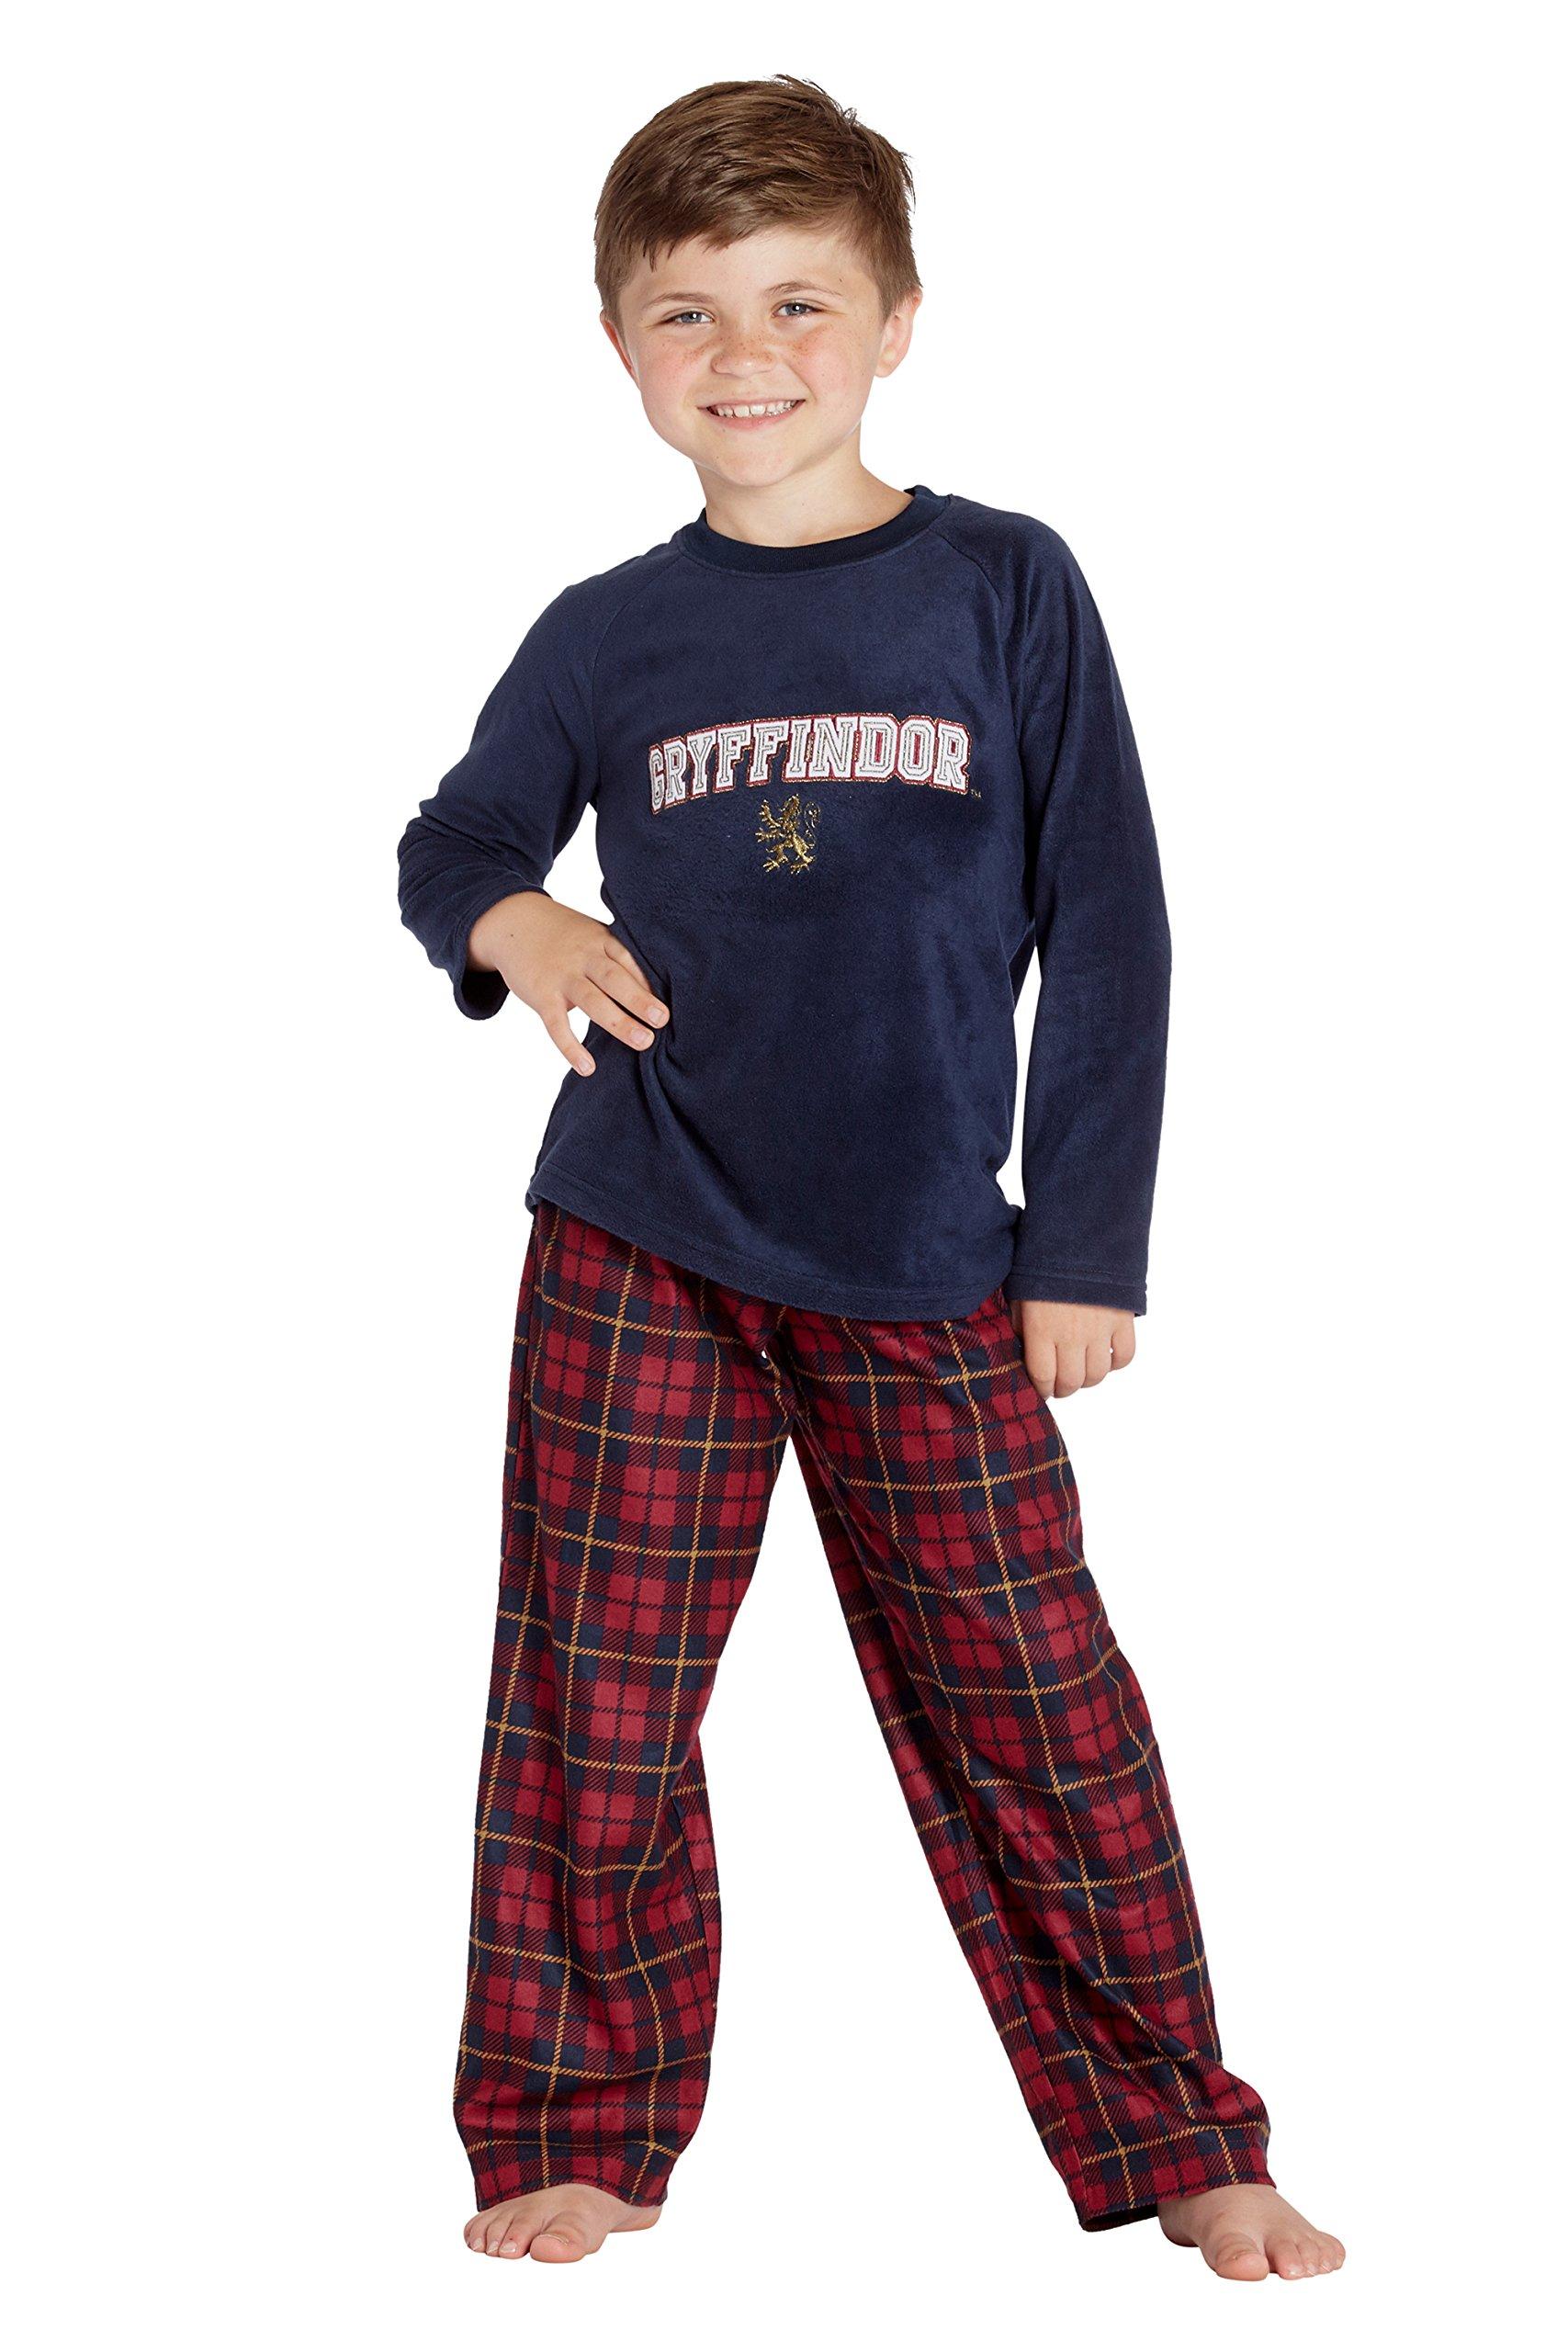 Harry Potter 'Gryffindor Lion' Christmas Plush Holiday Pajama Set, Navy, 8